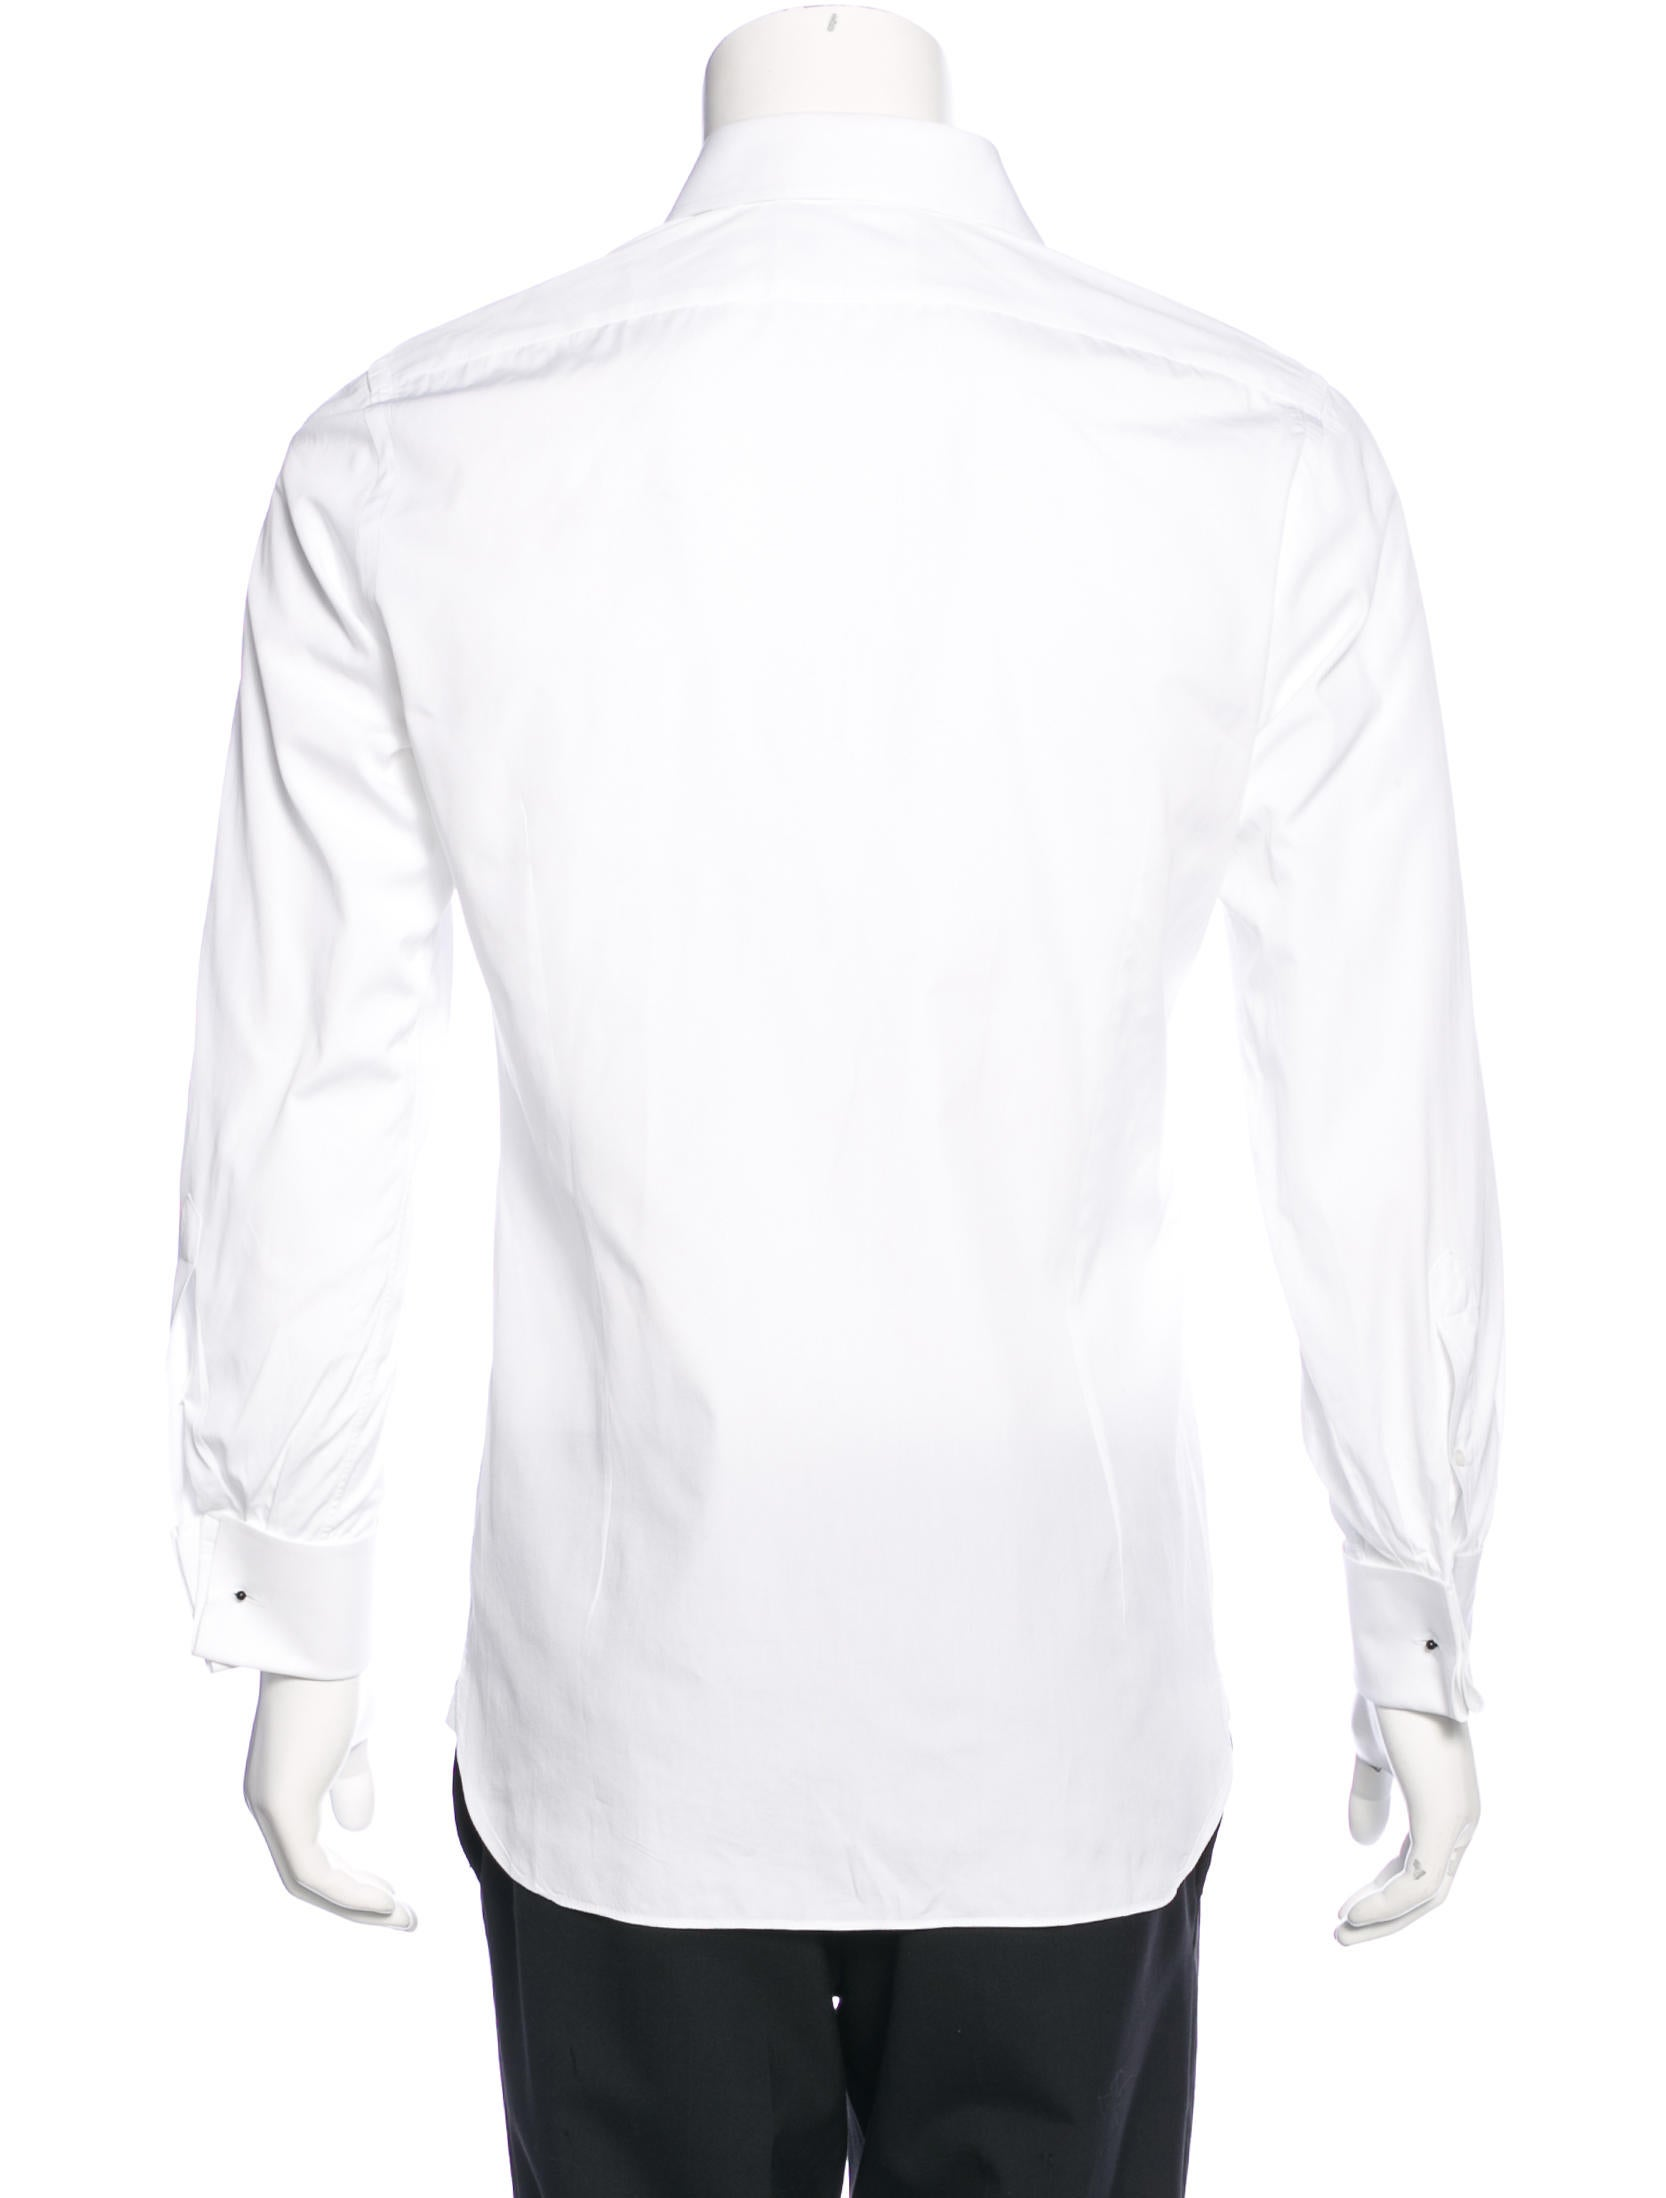 Tom ford french cuff dress shirt clothing tom33542 for Dress shirt french cuffs